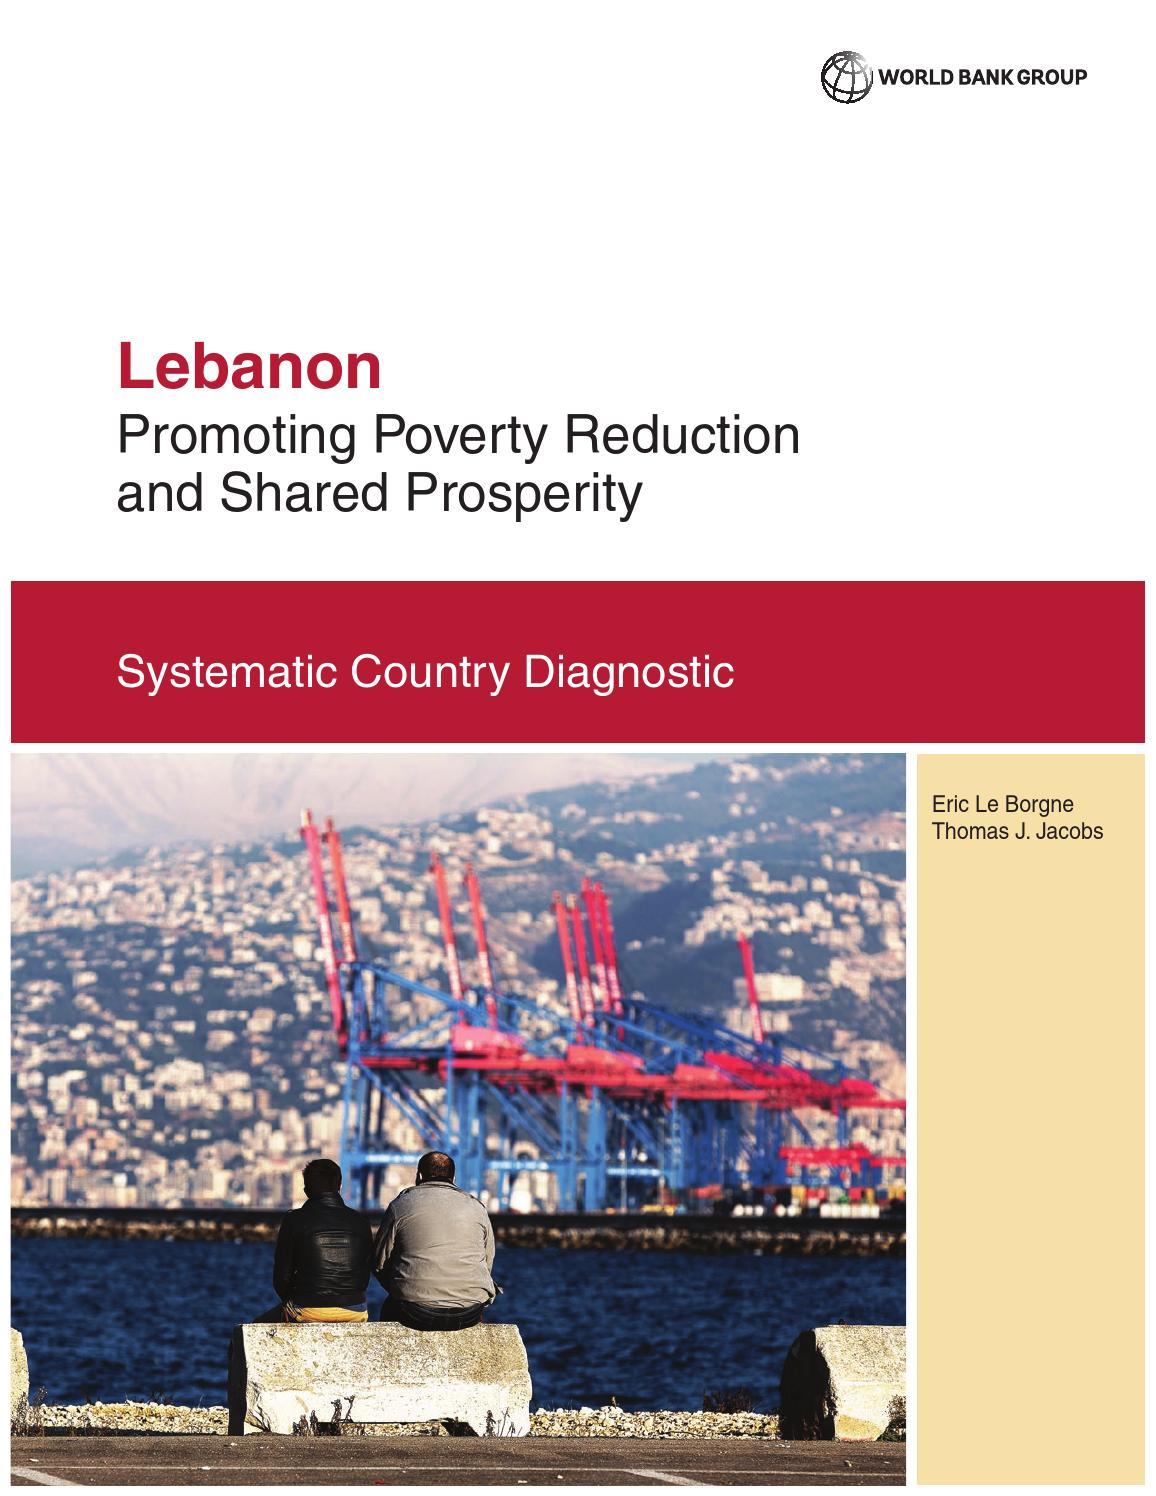 Electricite Du Liban Telephone lebanonworld bank group publications - issuu